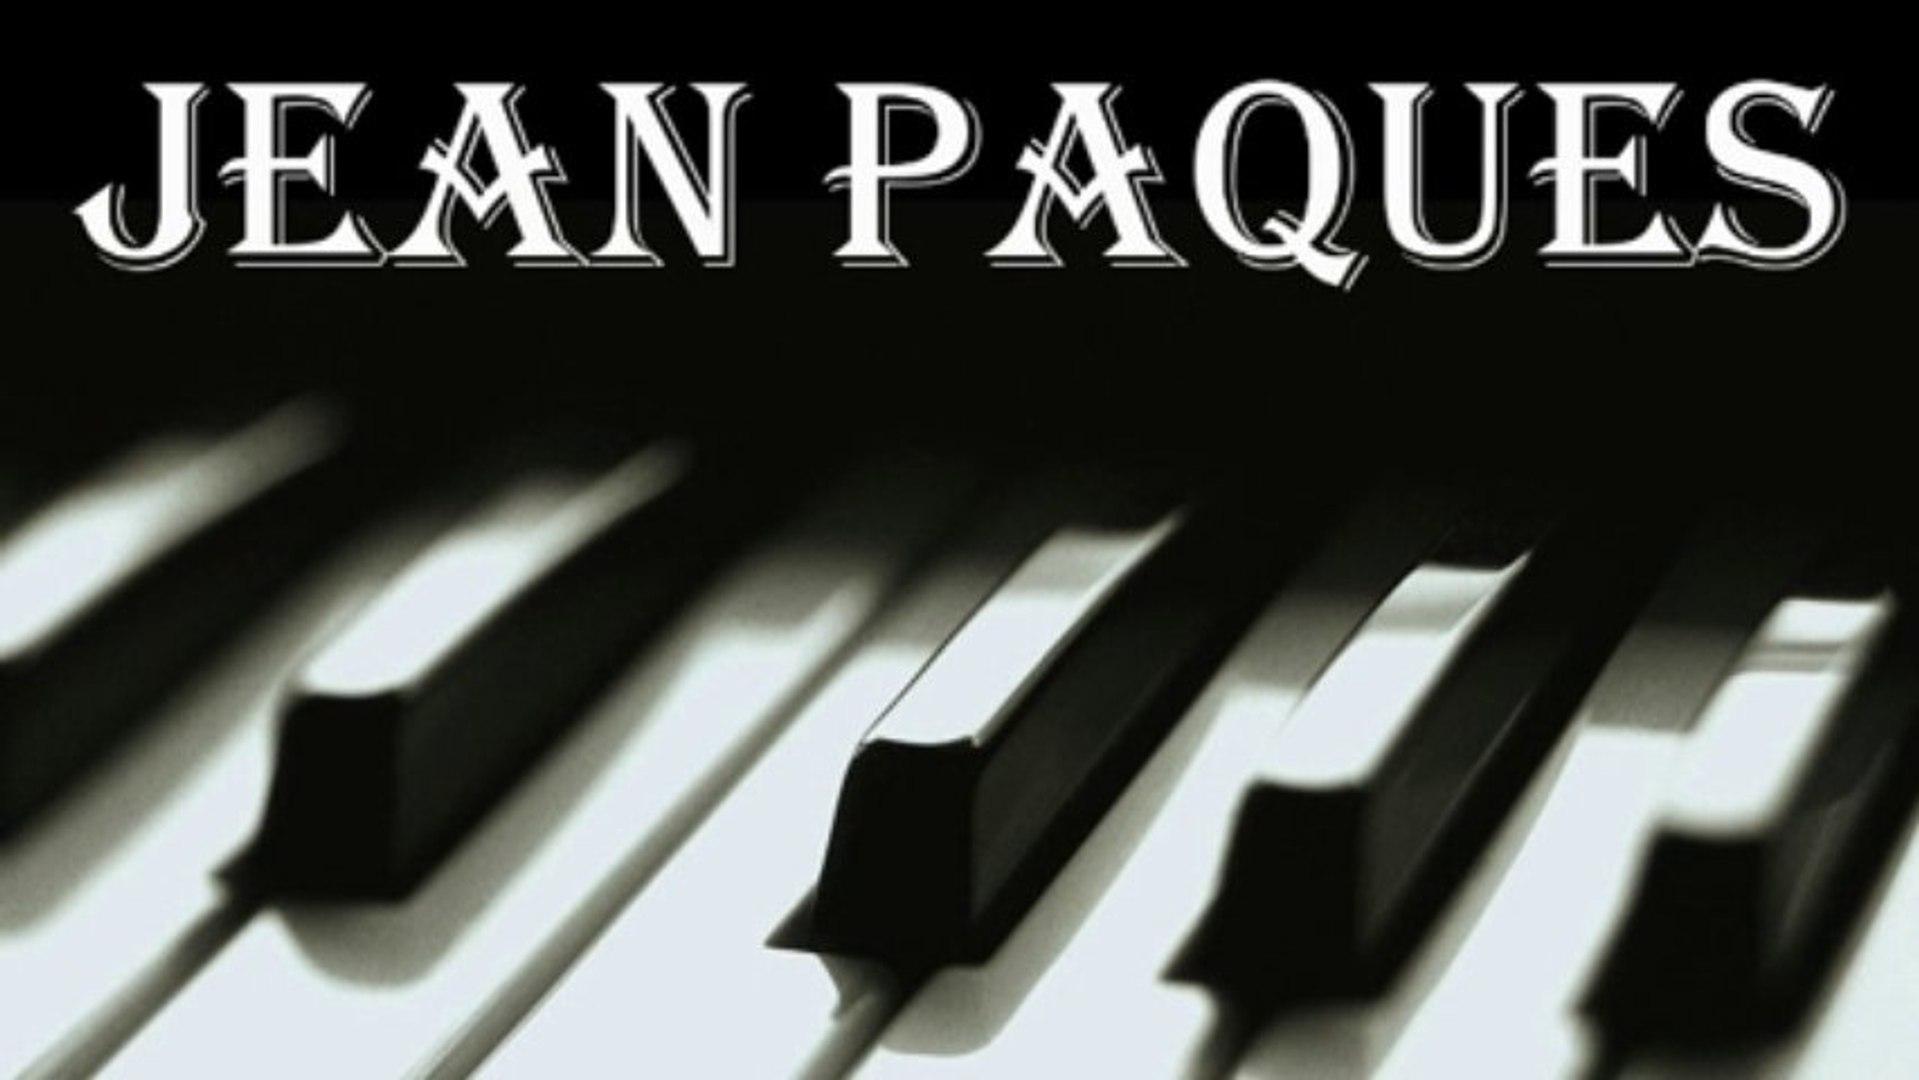 Jean Paques - Amor Amor Amor (HD) Officiel Elver Records